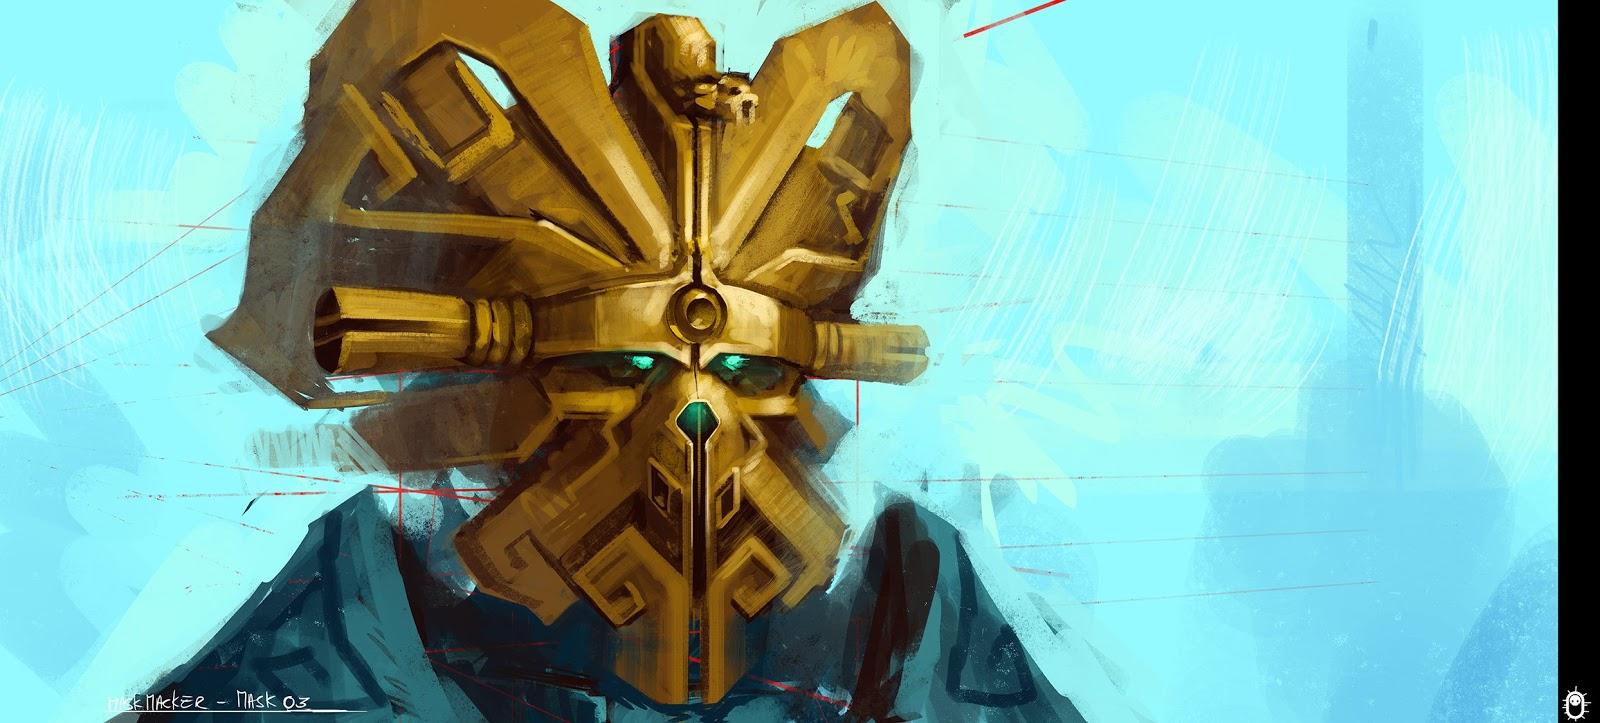 The Brickverse Bionicle 2015 Concept Art